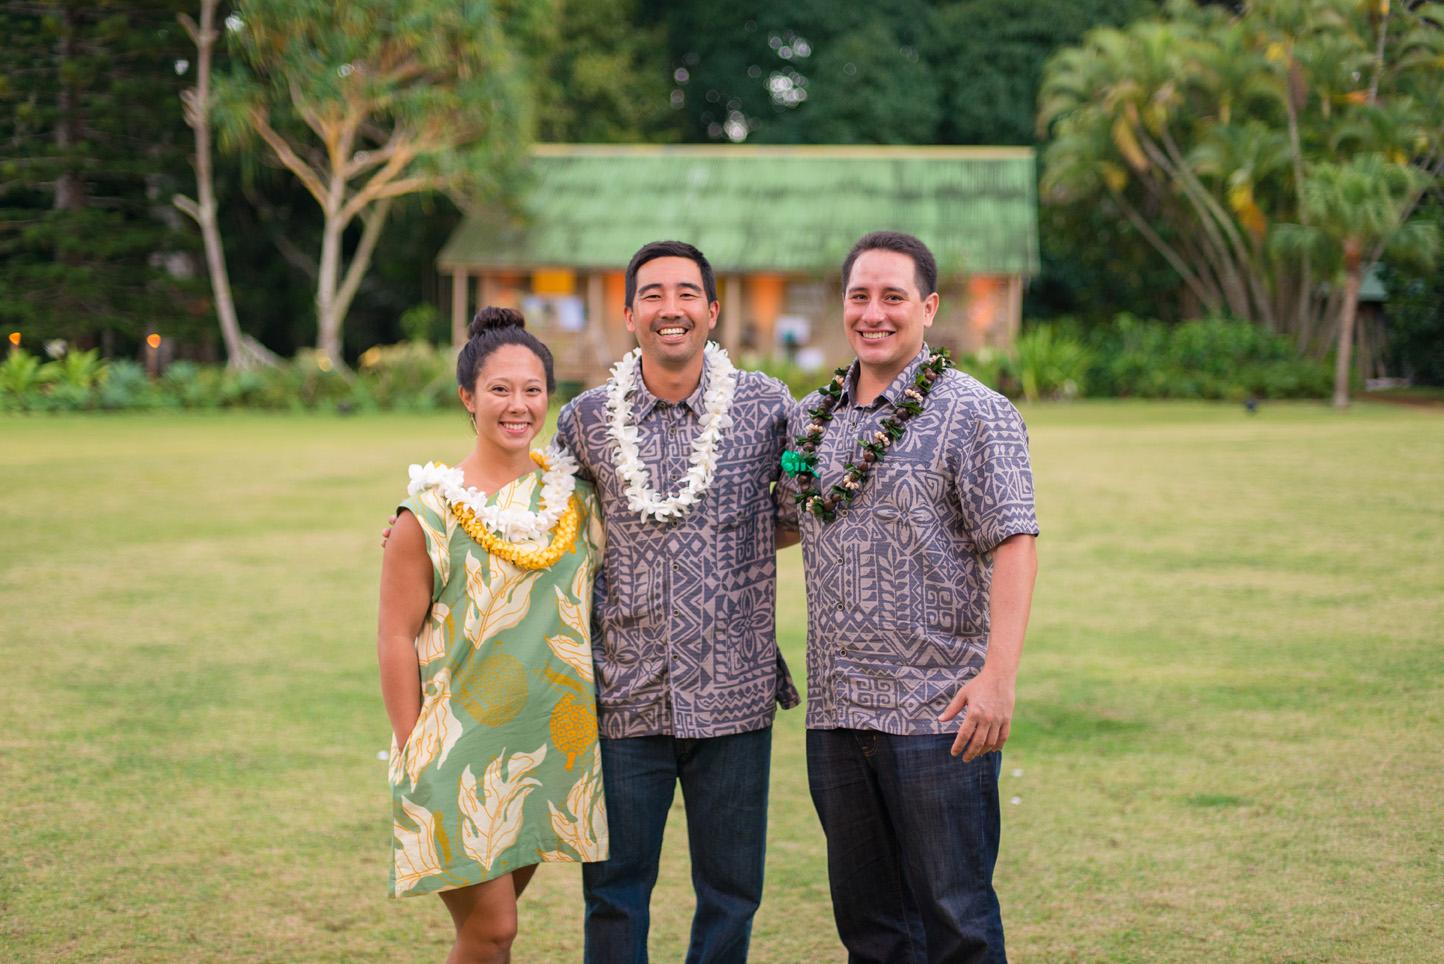 Centennial Photo Gallery Kauai - Hawaii Community Foundation